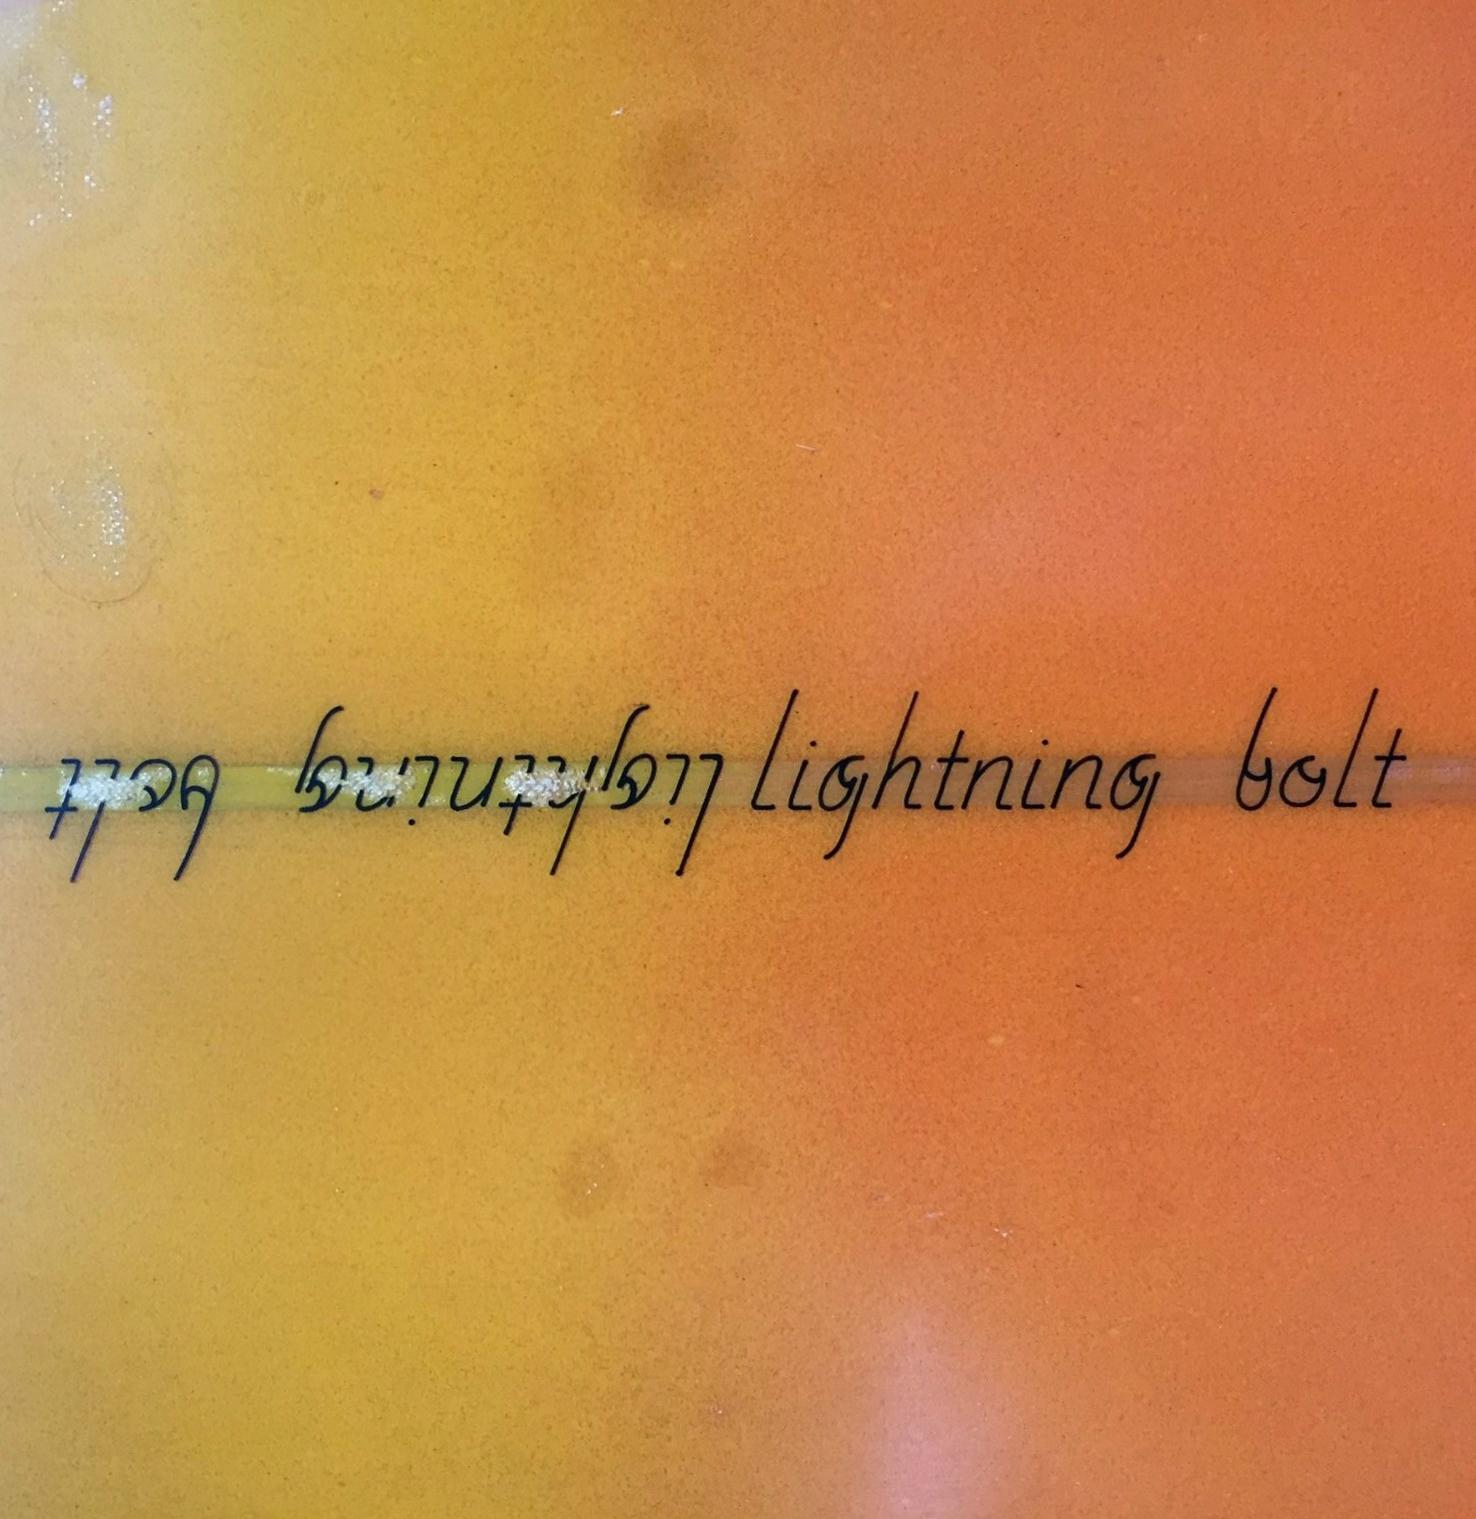 Terry Fitzgerald Lightning Bolt Surfboard Logo.jpg